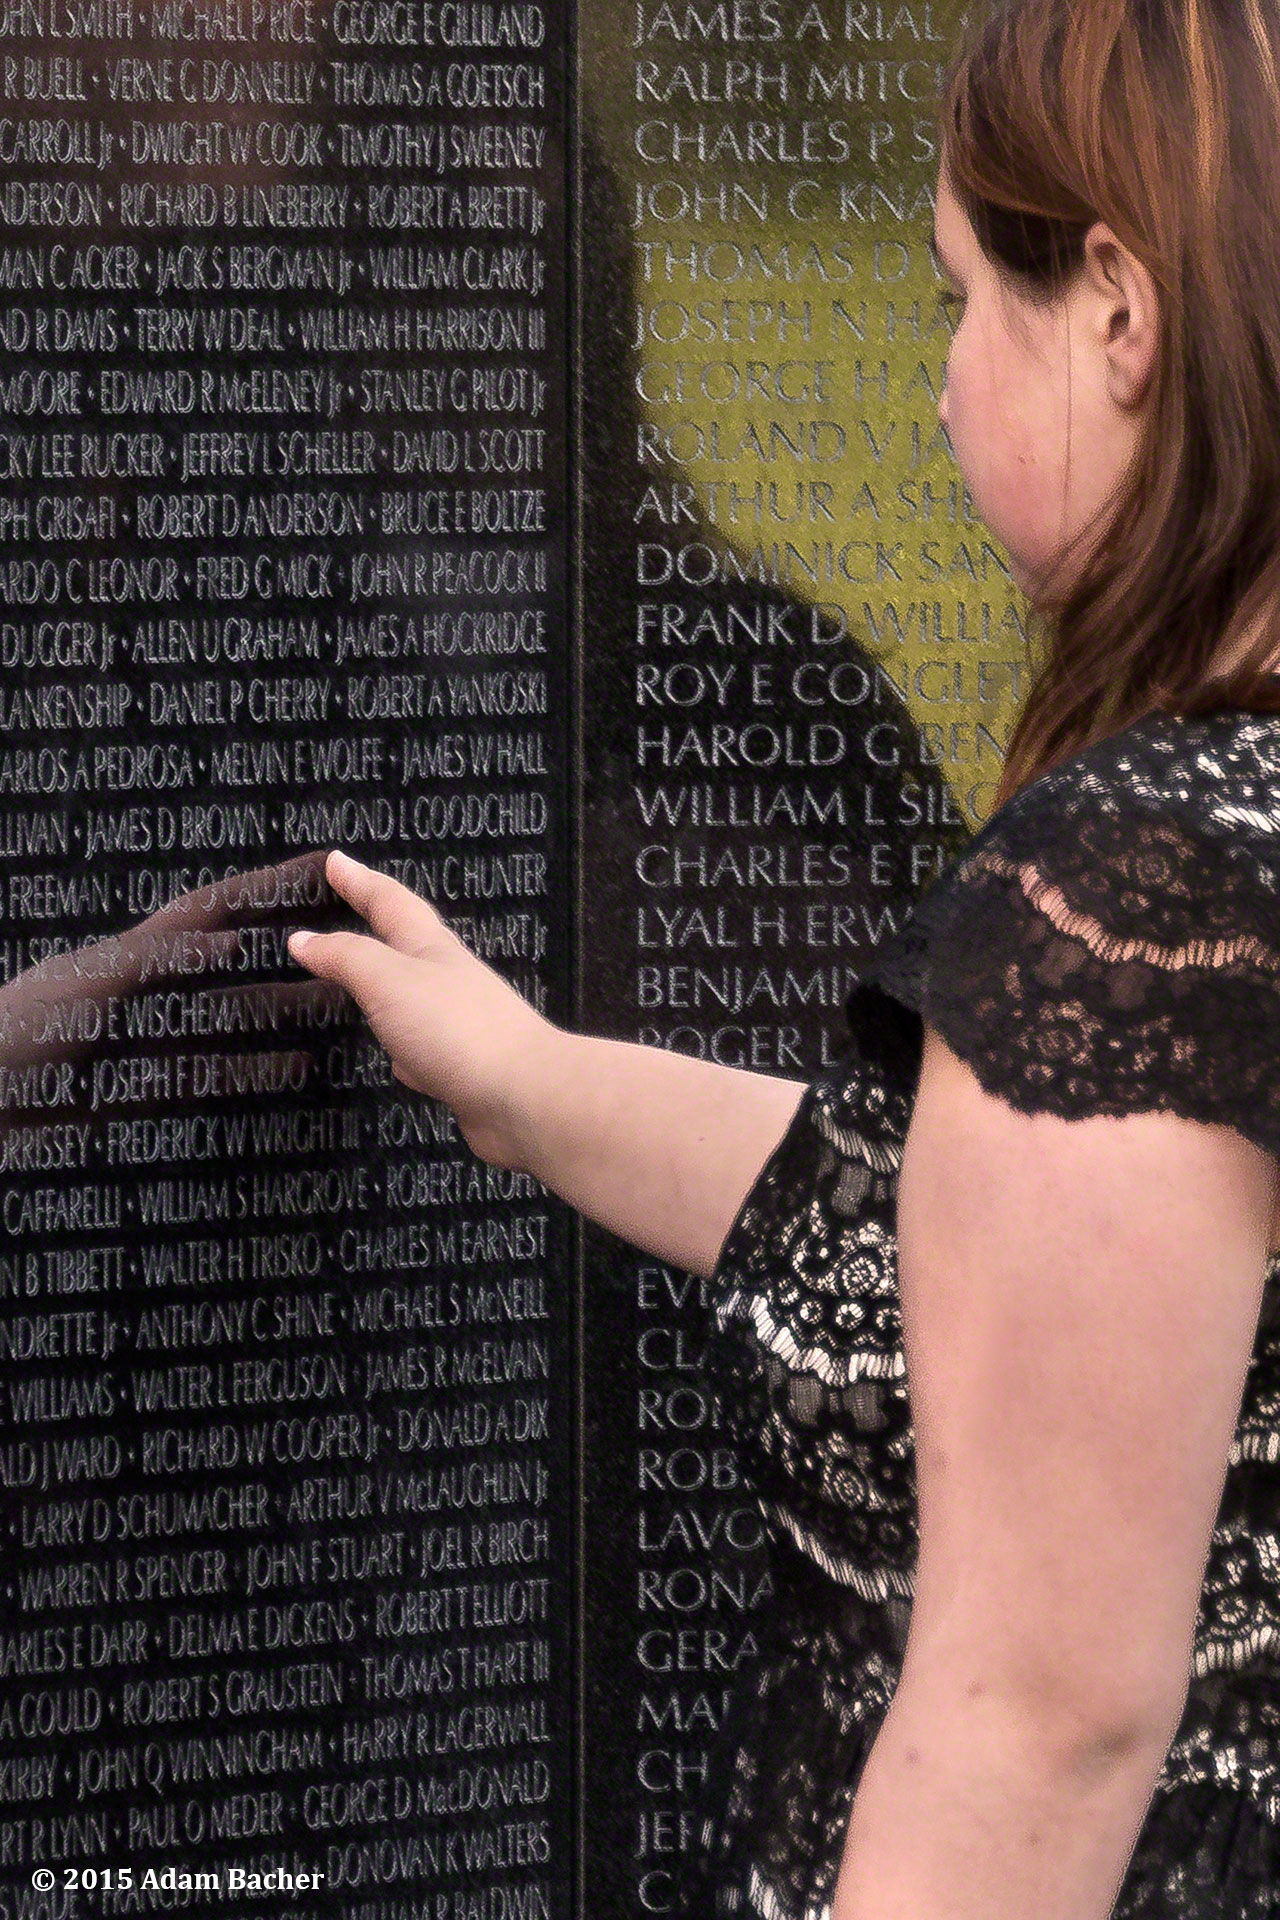 Veterans Day and Vietnam War memorial